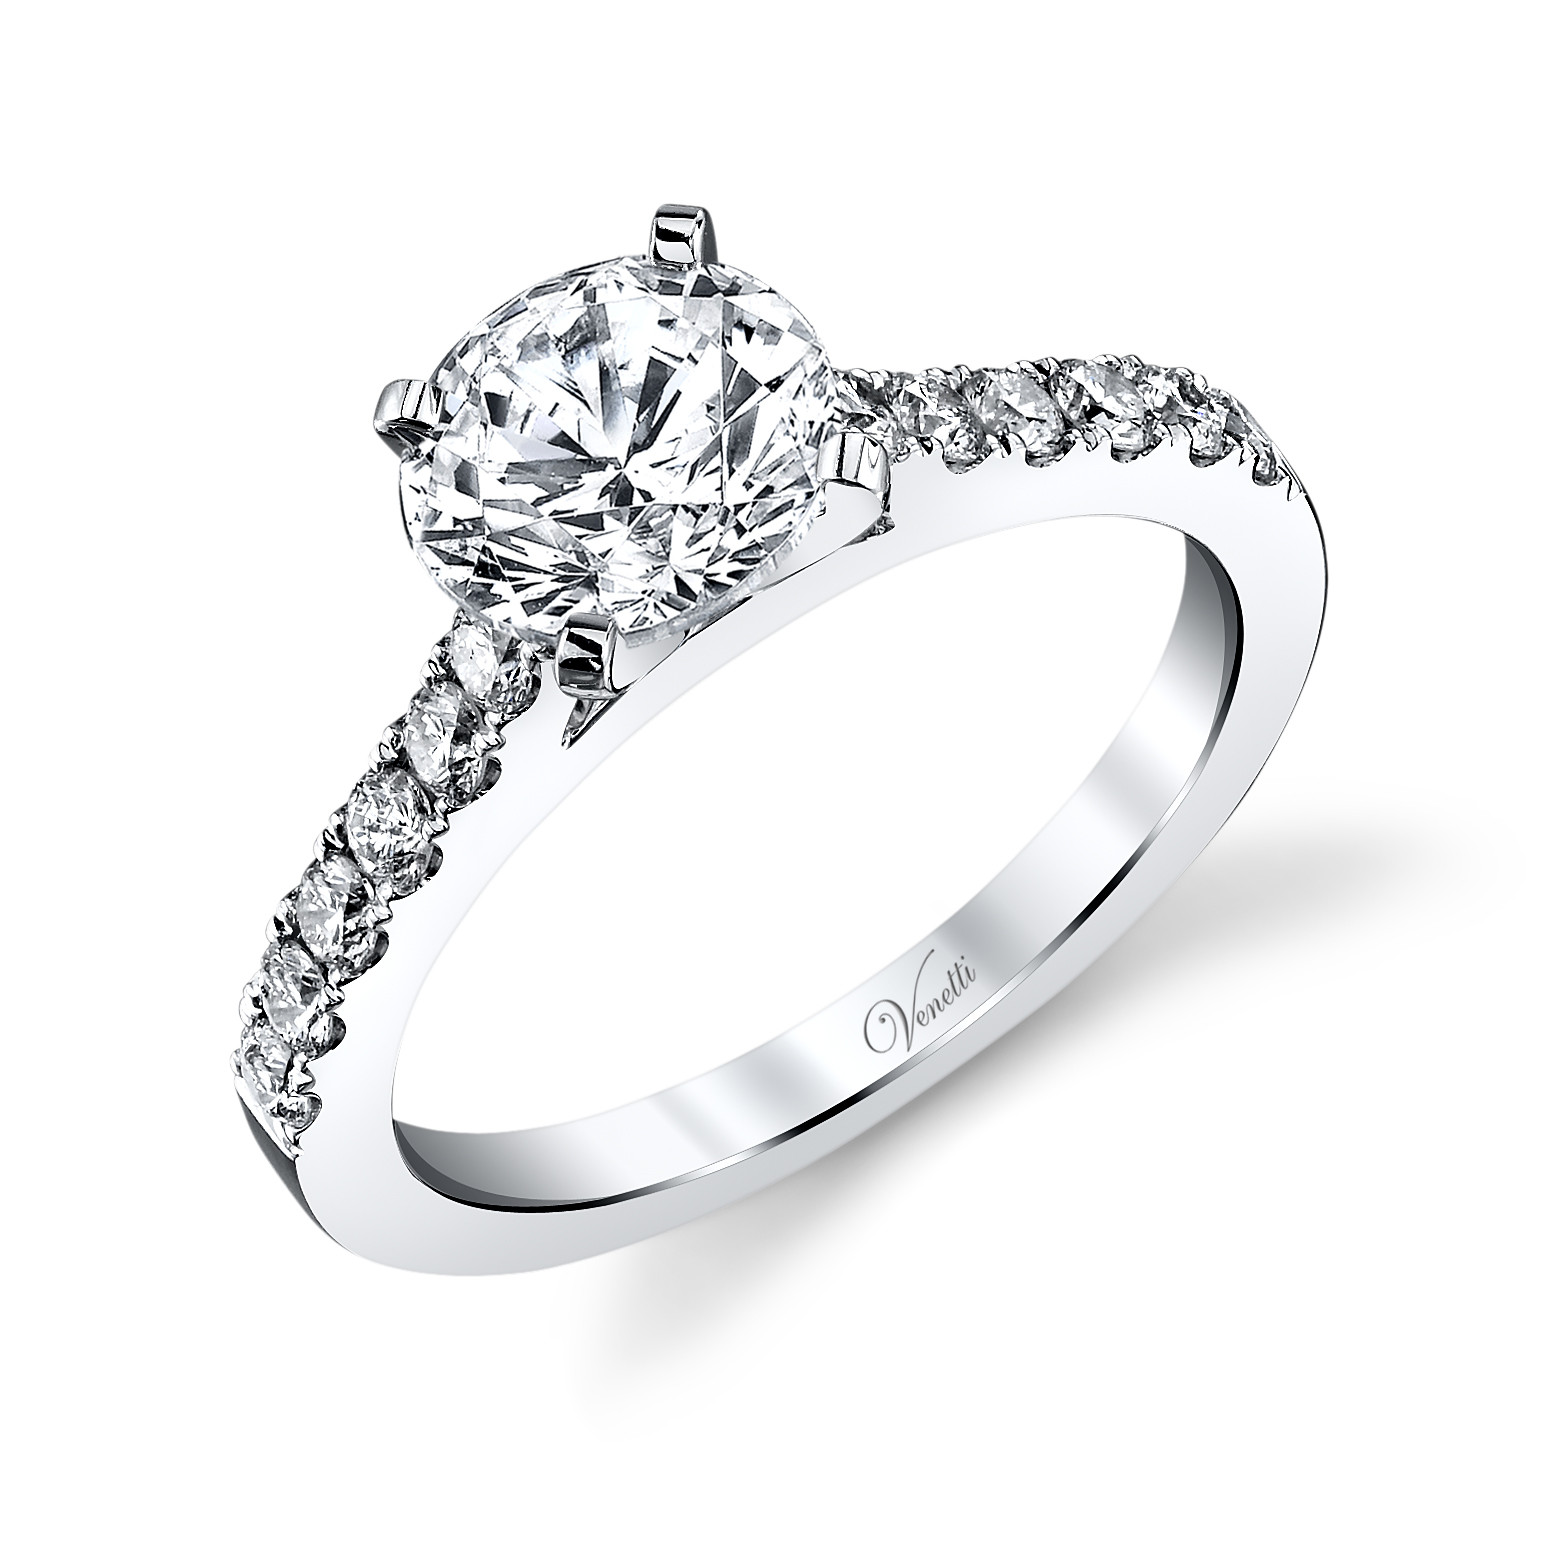 New Venetti 0.43 CTW Diamond Engagement Ring Setting